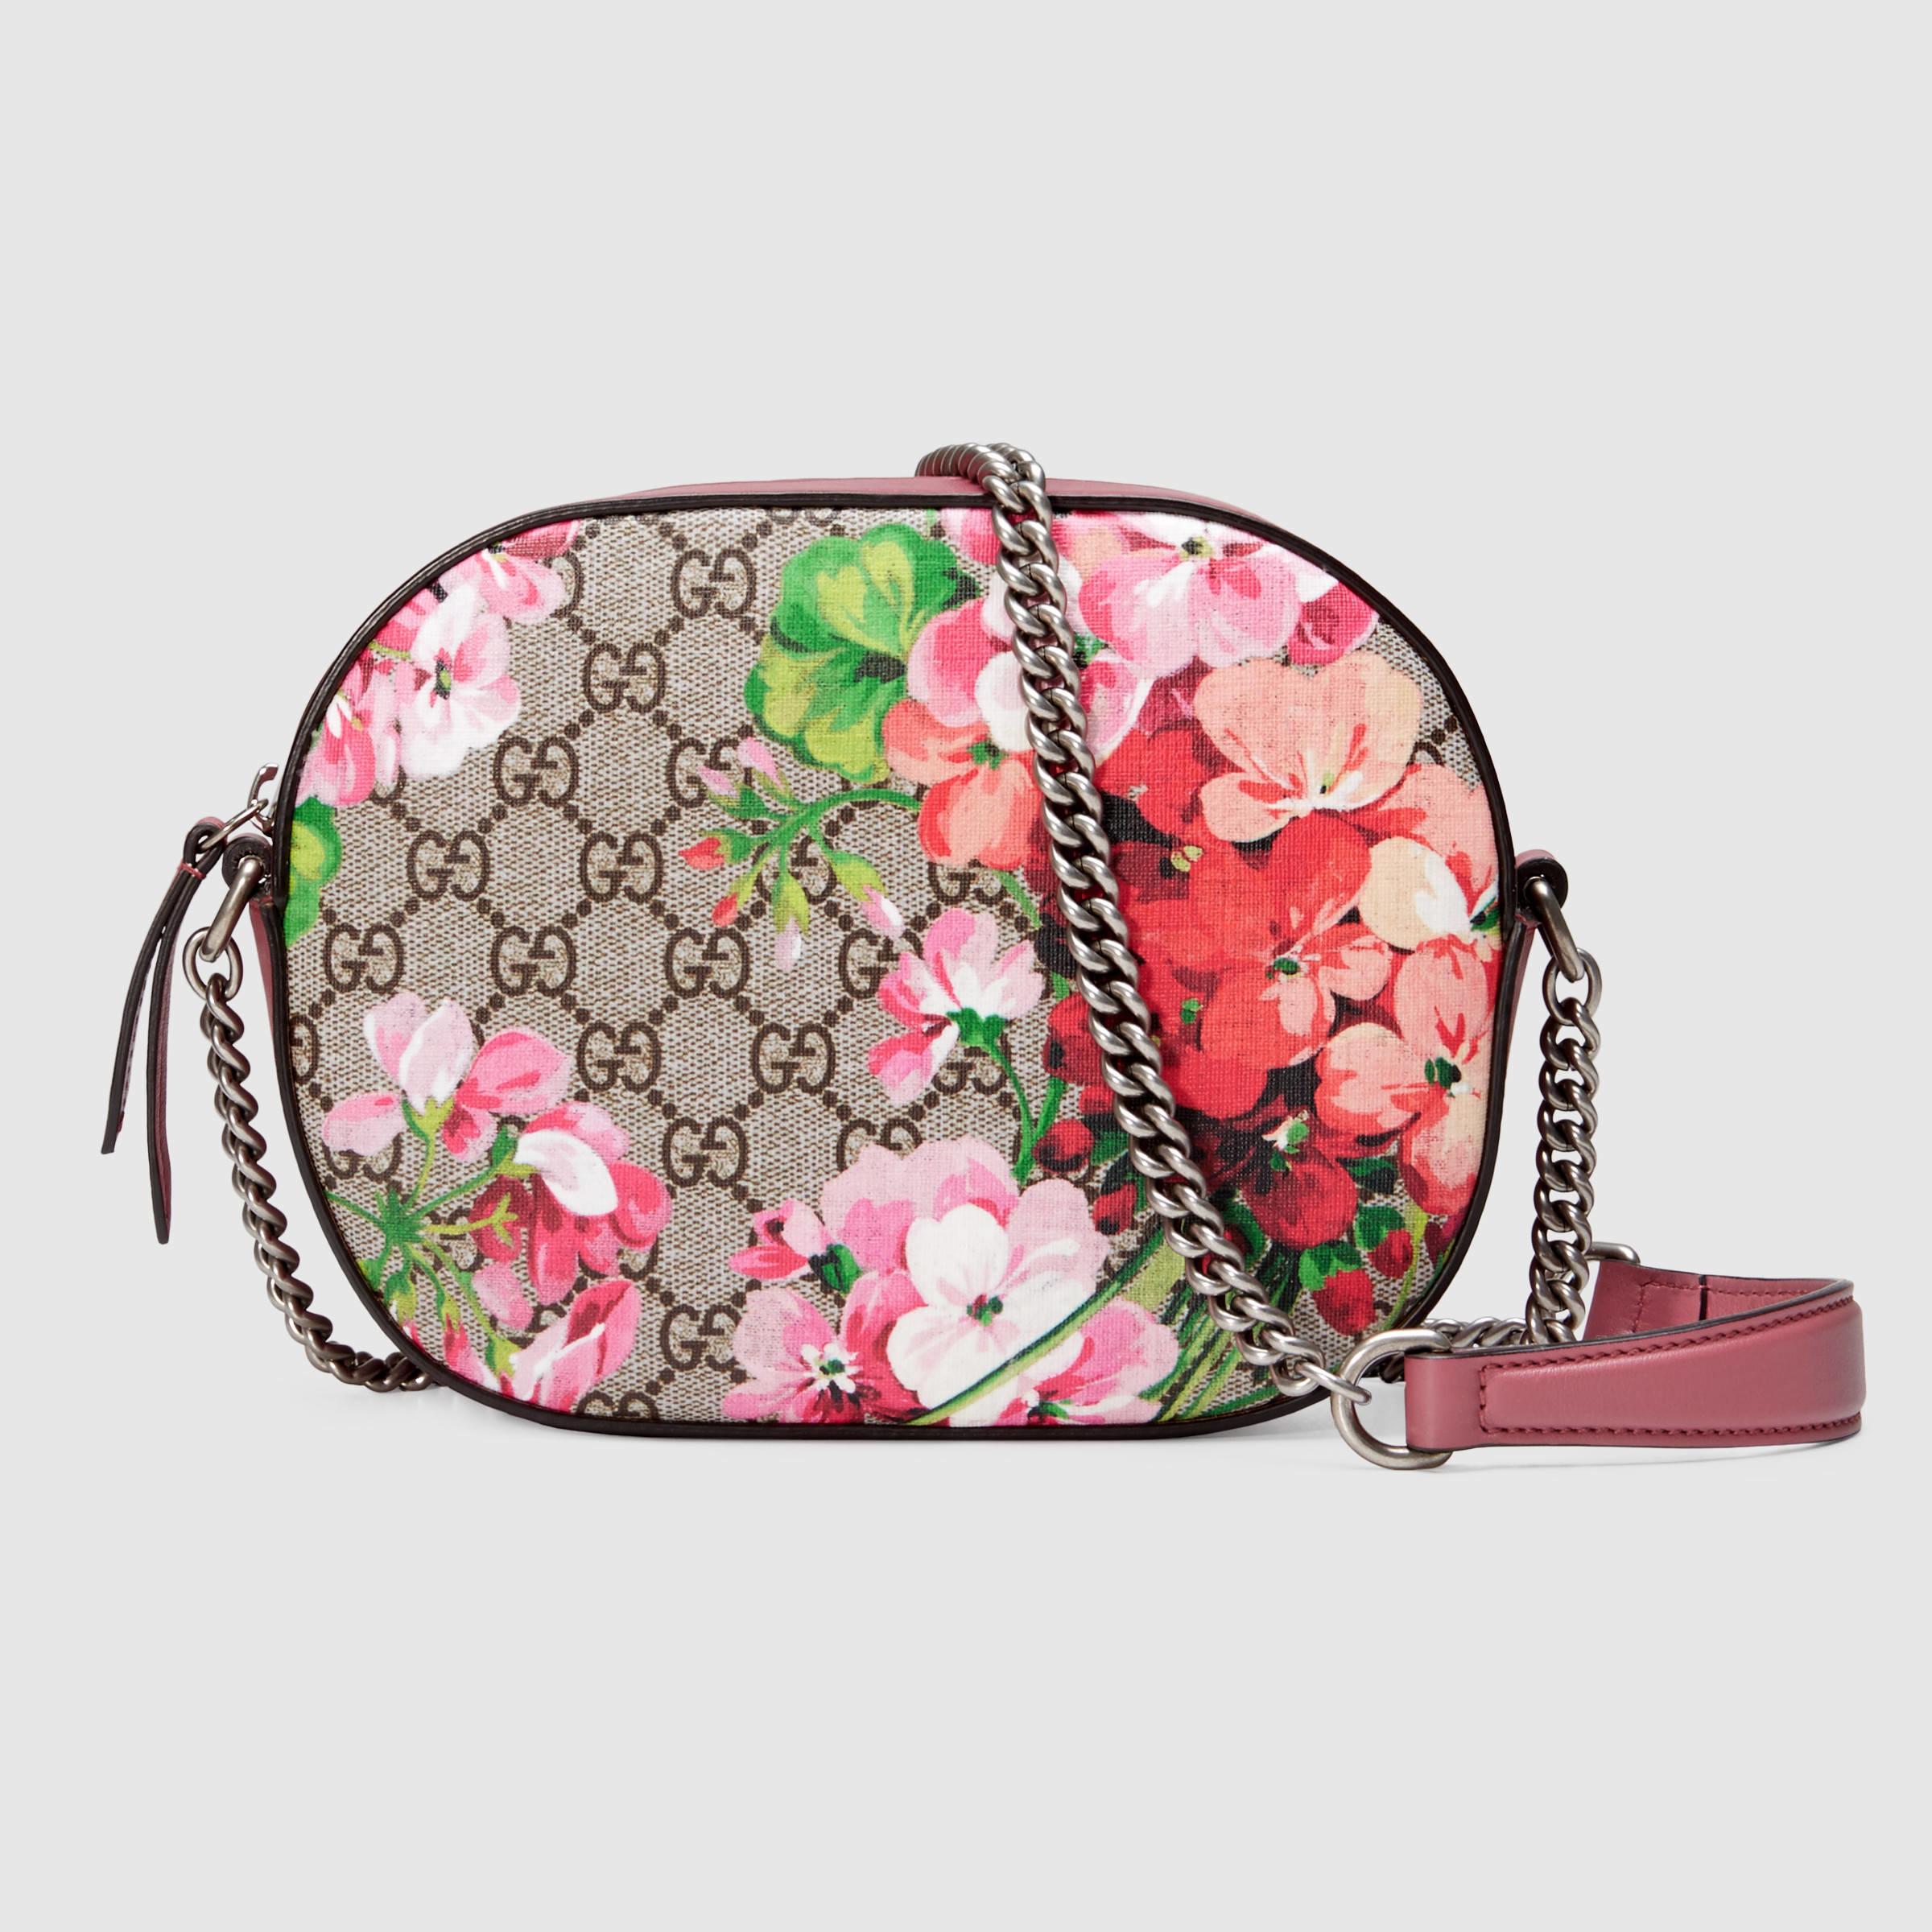 087d9c5e1b3 Lyst - Gucci Blooms GG Supreme Mini Chain Shoulder Bag